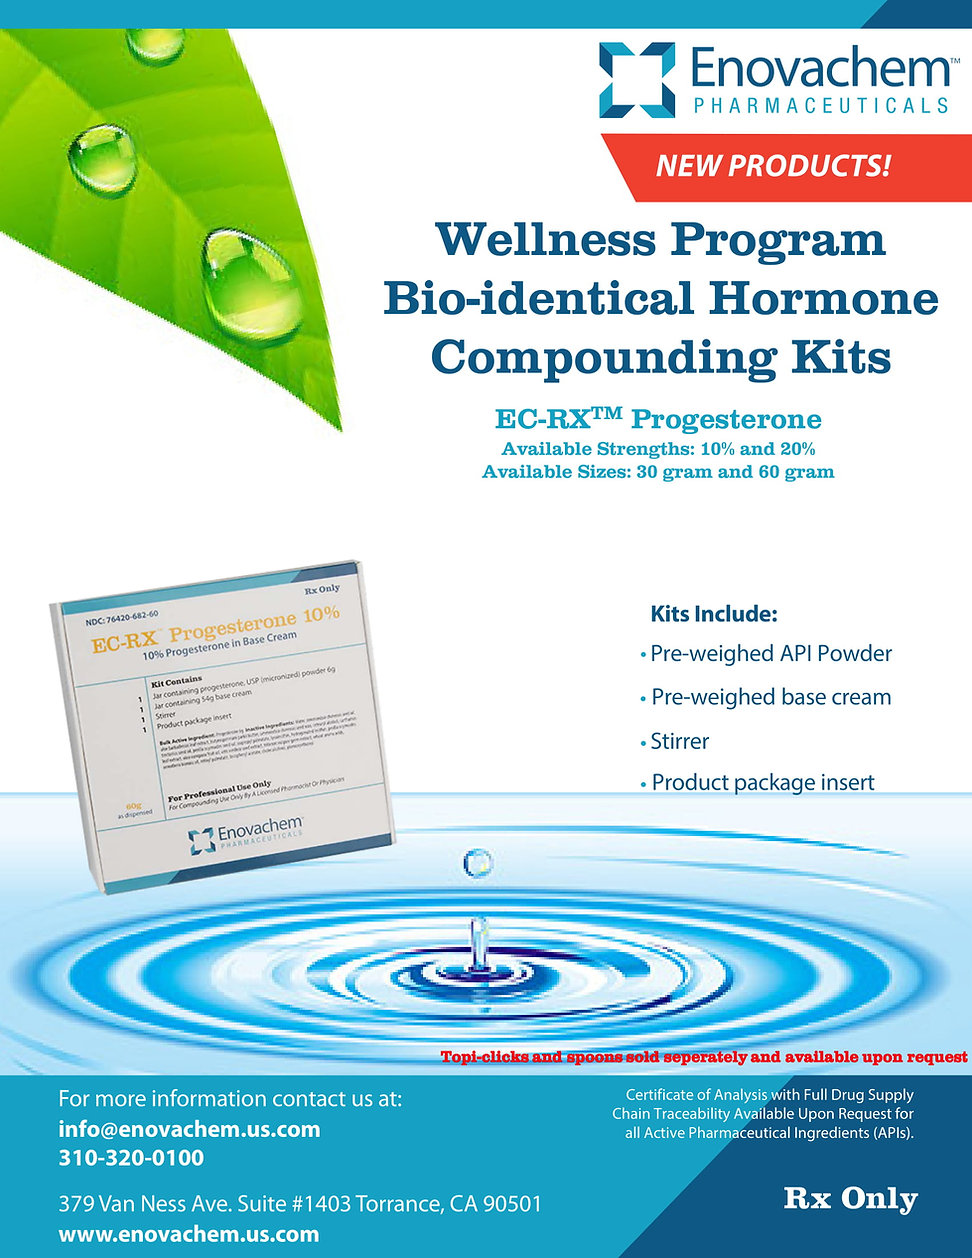 ECRX Progesterone Flyer 010920-1.jpg